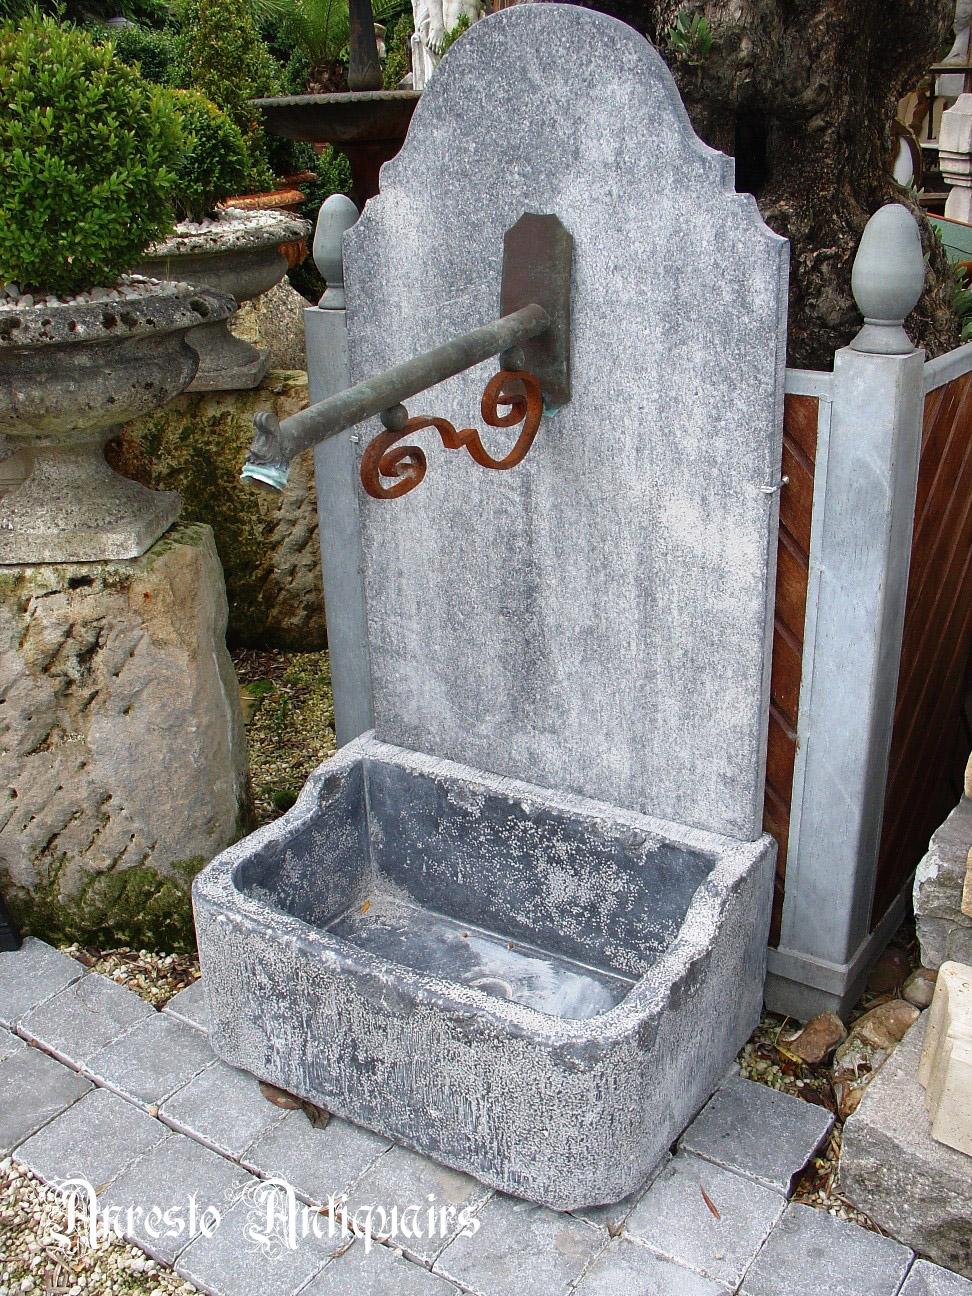 Ref. 67 – Blauwstenen spoelbak met rugwand en fonteinuitloop